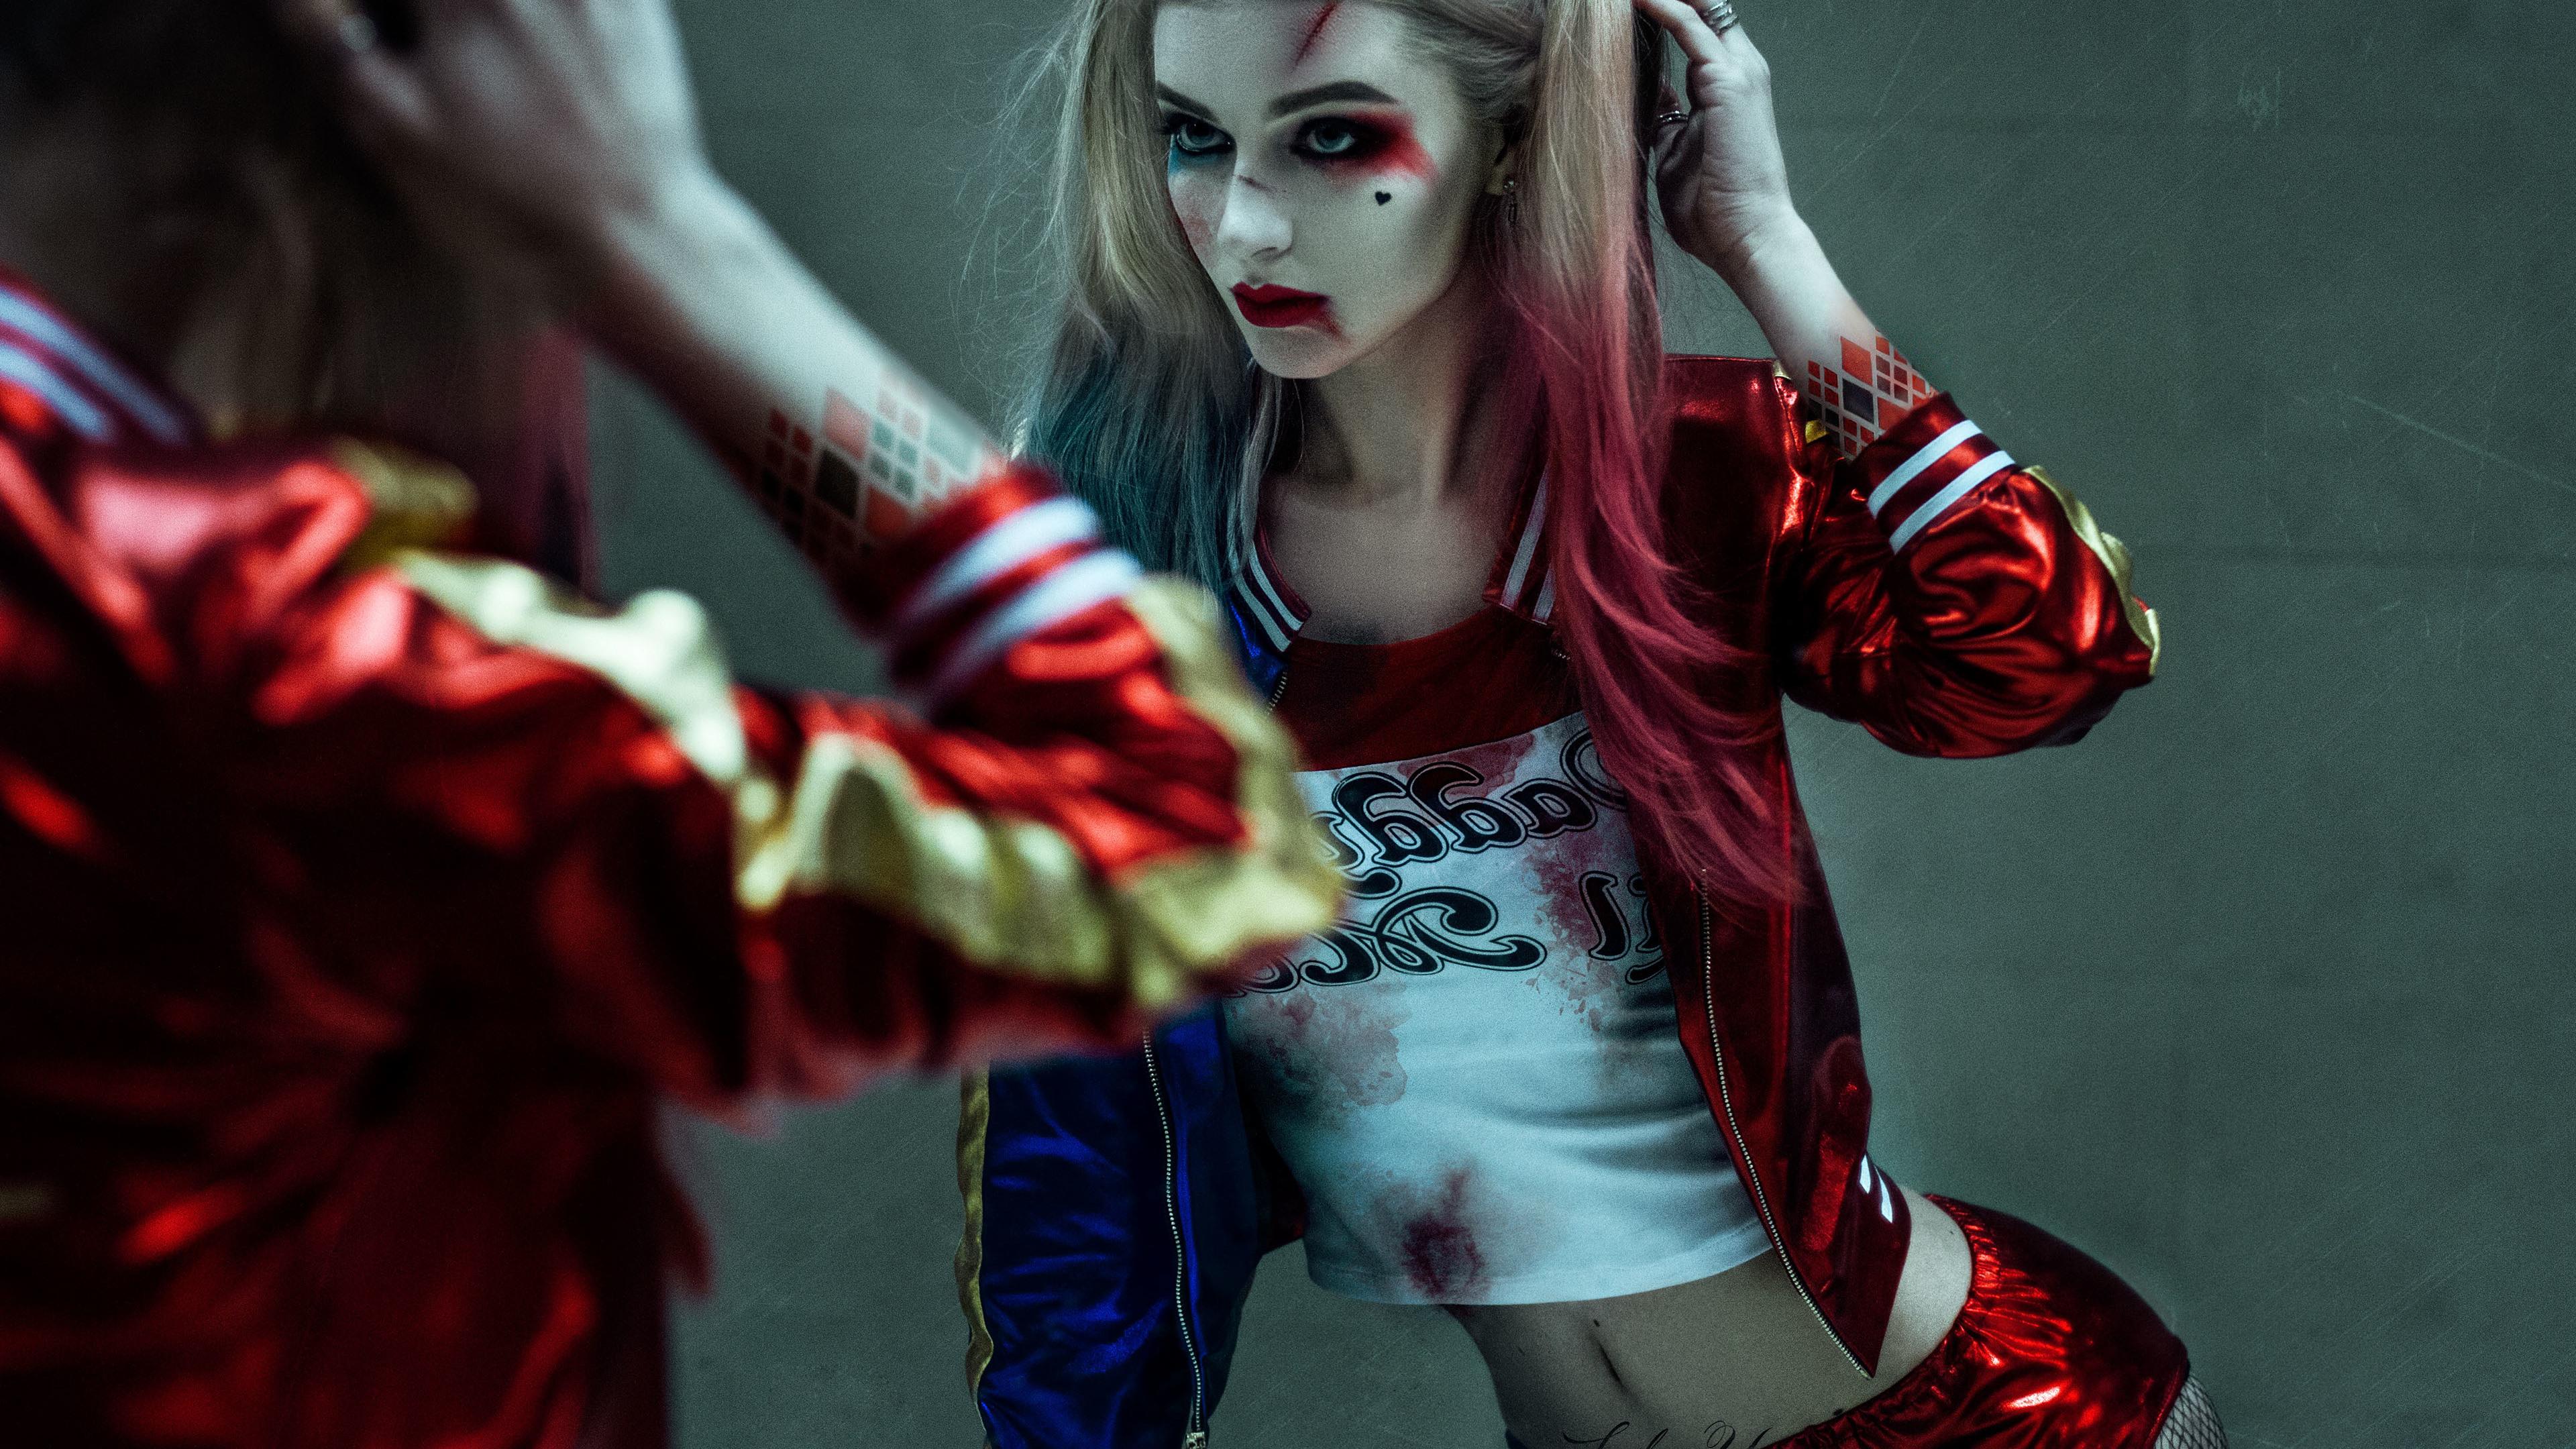 cosplay harley quinn 1536401958 - Cosplay Harley Quinn - suicide squad wallpapers, hd-wallpapers, harley quinn wallpapers, cosplay wallpapers, 5k wallpapers, 4k-wallpapers